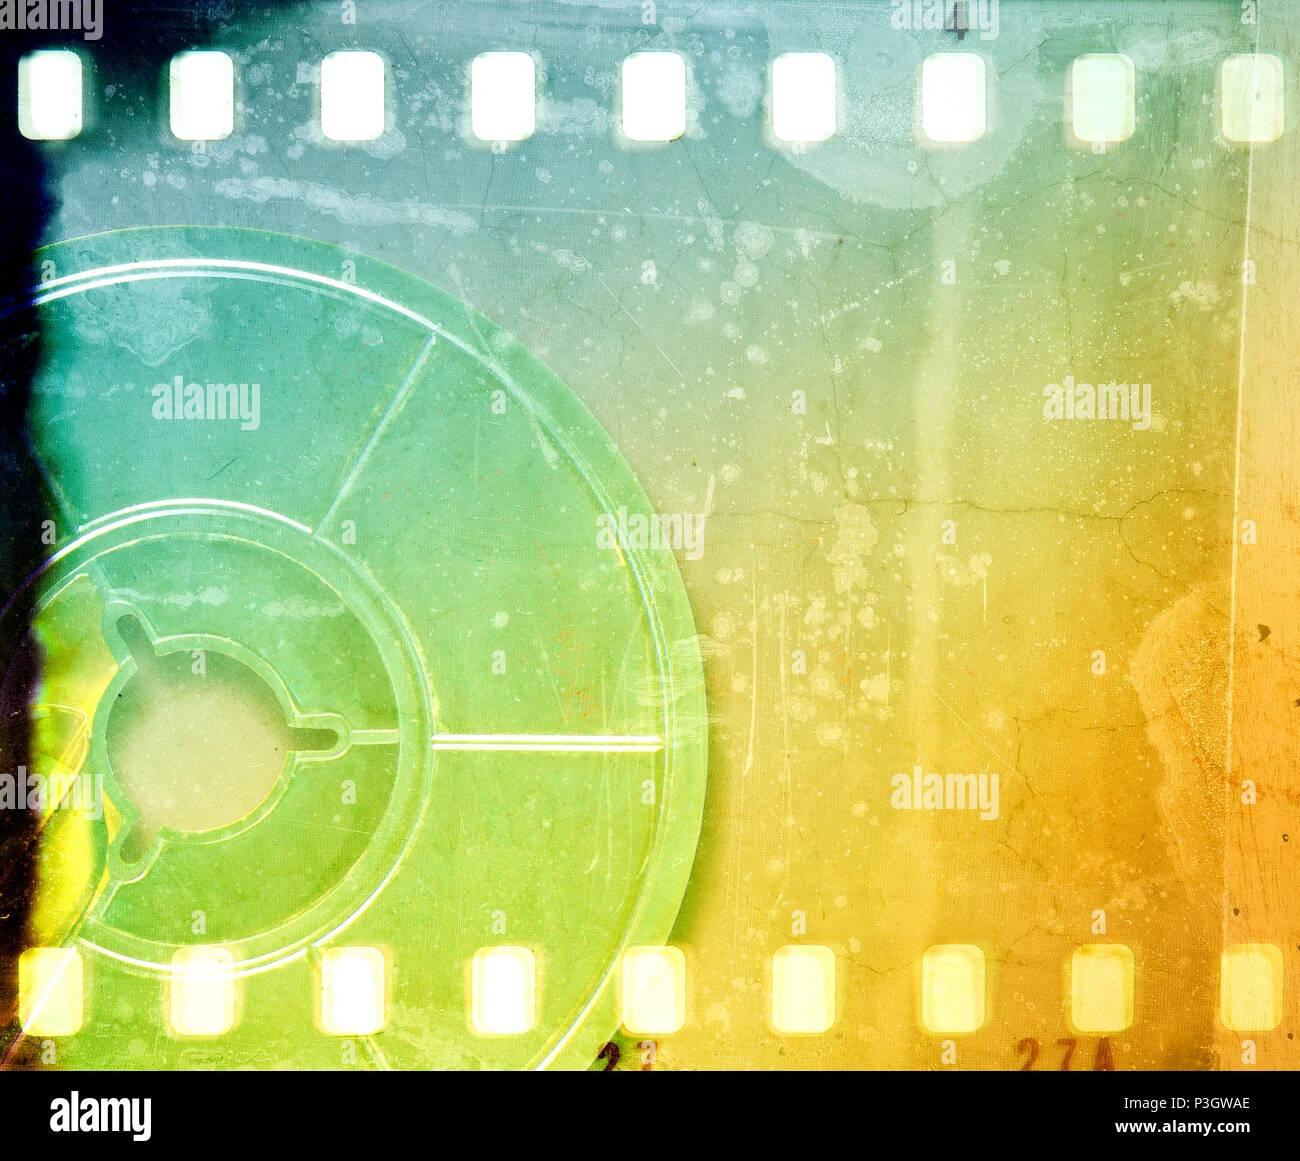 Vintage Blue Metal Film Reel Stockfotos & Vintage Blue Metal Film ...